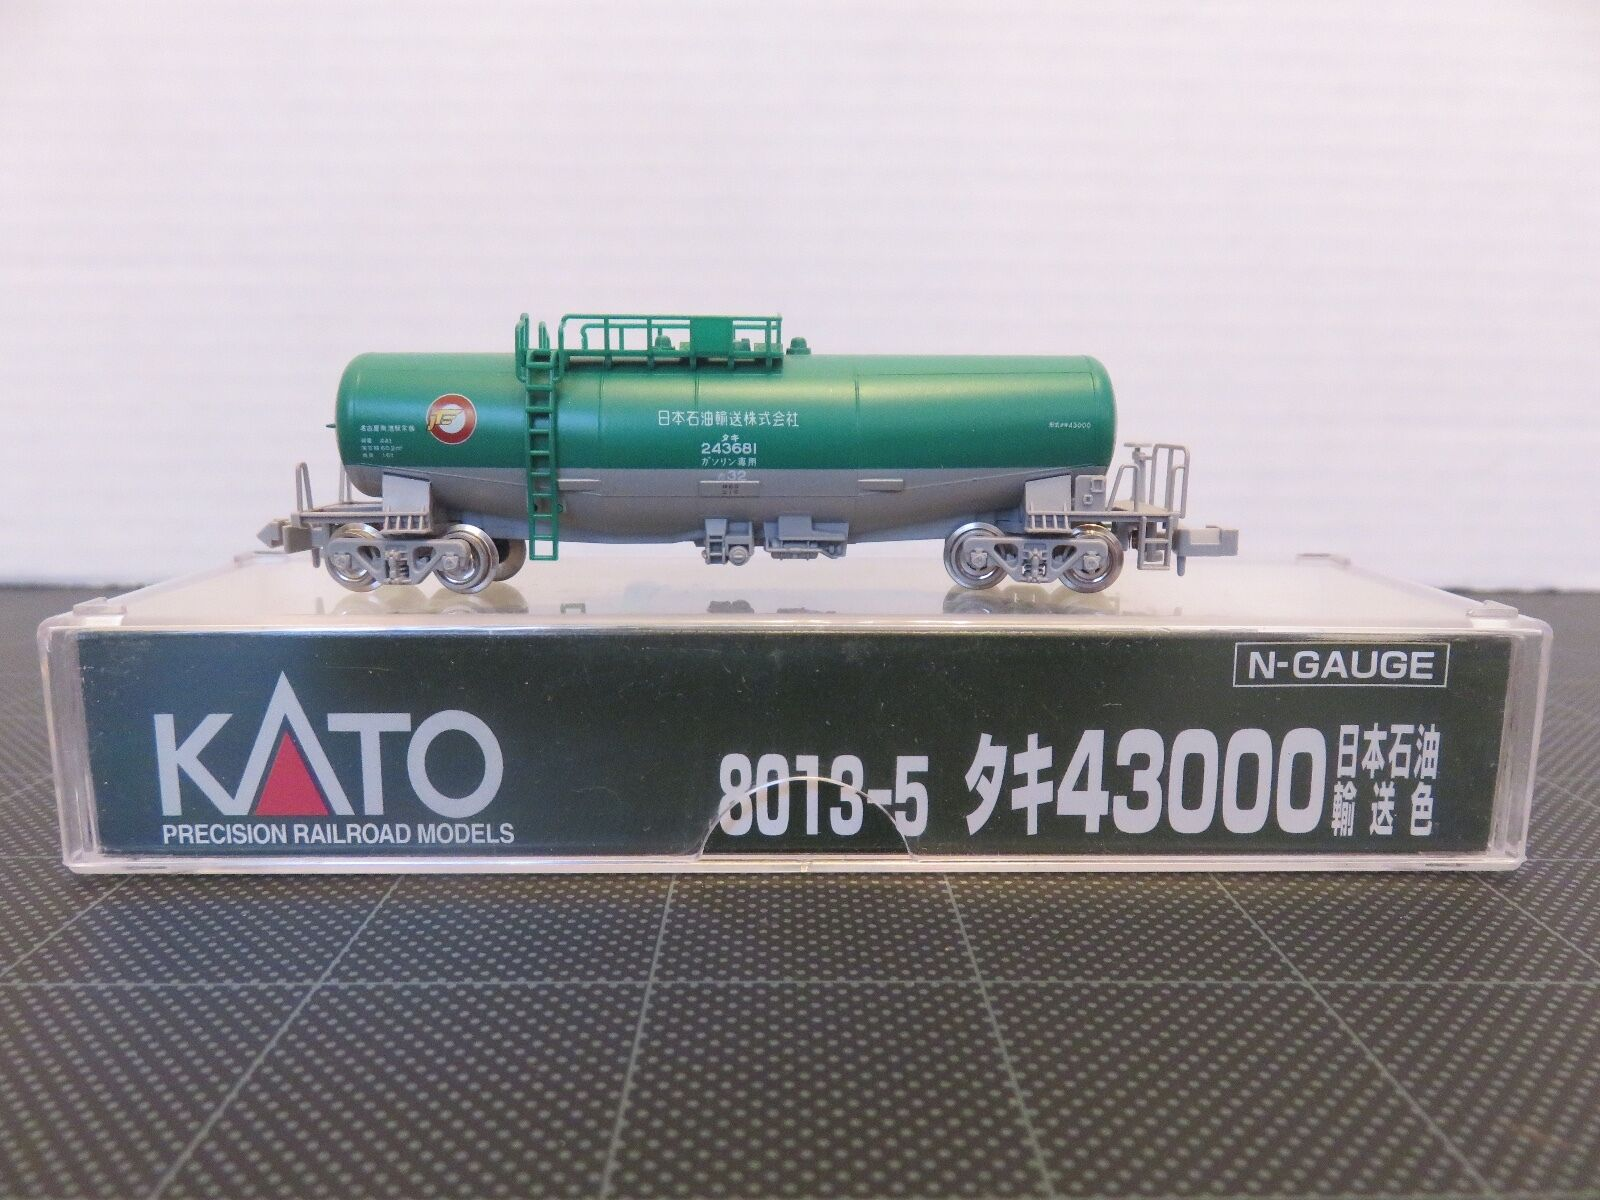 KATO 8013-5 Series 43000 Japanese TANK CAR Model Train N-Scale verde/grigio T165